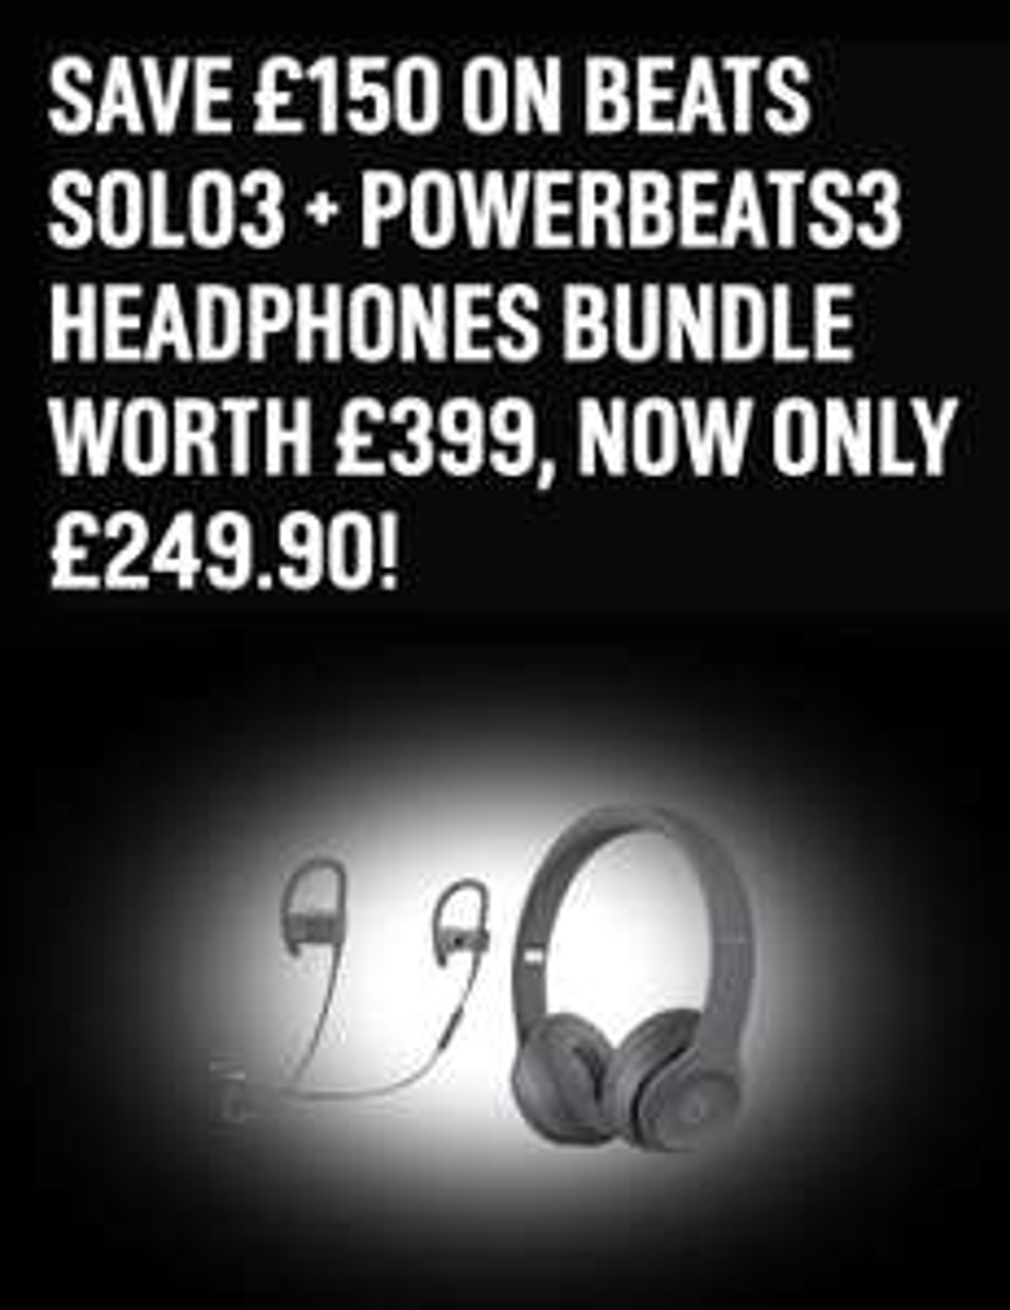 Beats Solo 3 and Beats Powerbeats 3 bundle - £249.95 at Argos